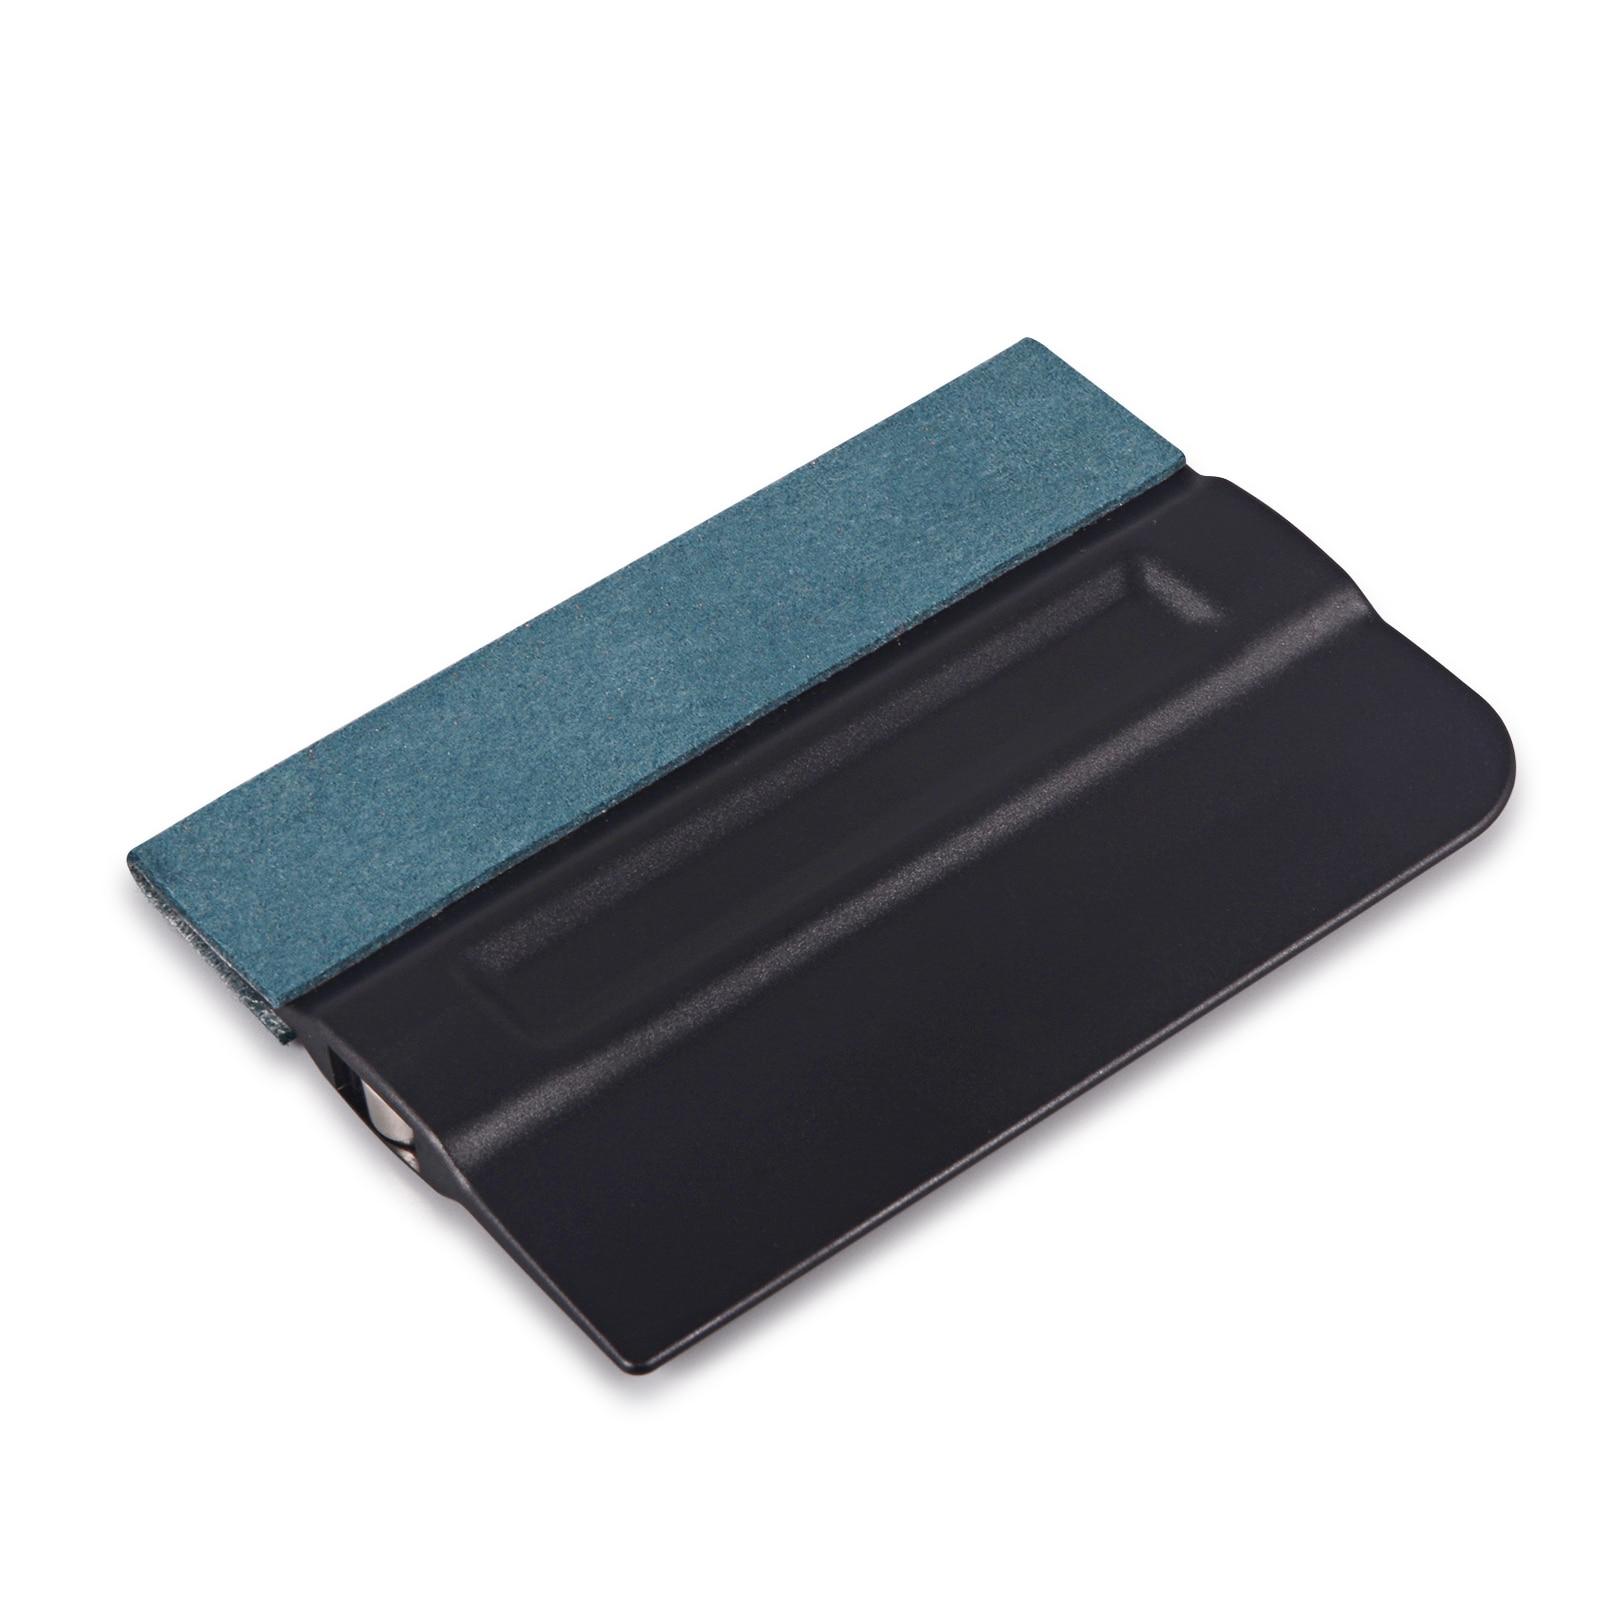 Image 5 - FOSHIO 5pcs Carbon Fiber Vinyl Film Car Wrap Magnetic Squeegee Window Tint No Scratch Suede Felt Magnet Scraper Car Sticker Tool-in Scraper from Automobiles & Motorcycles